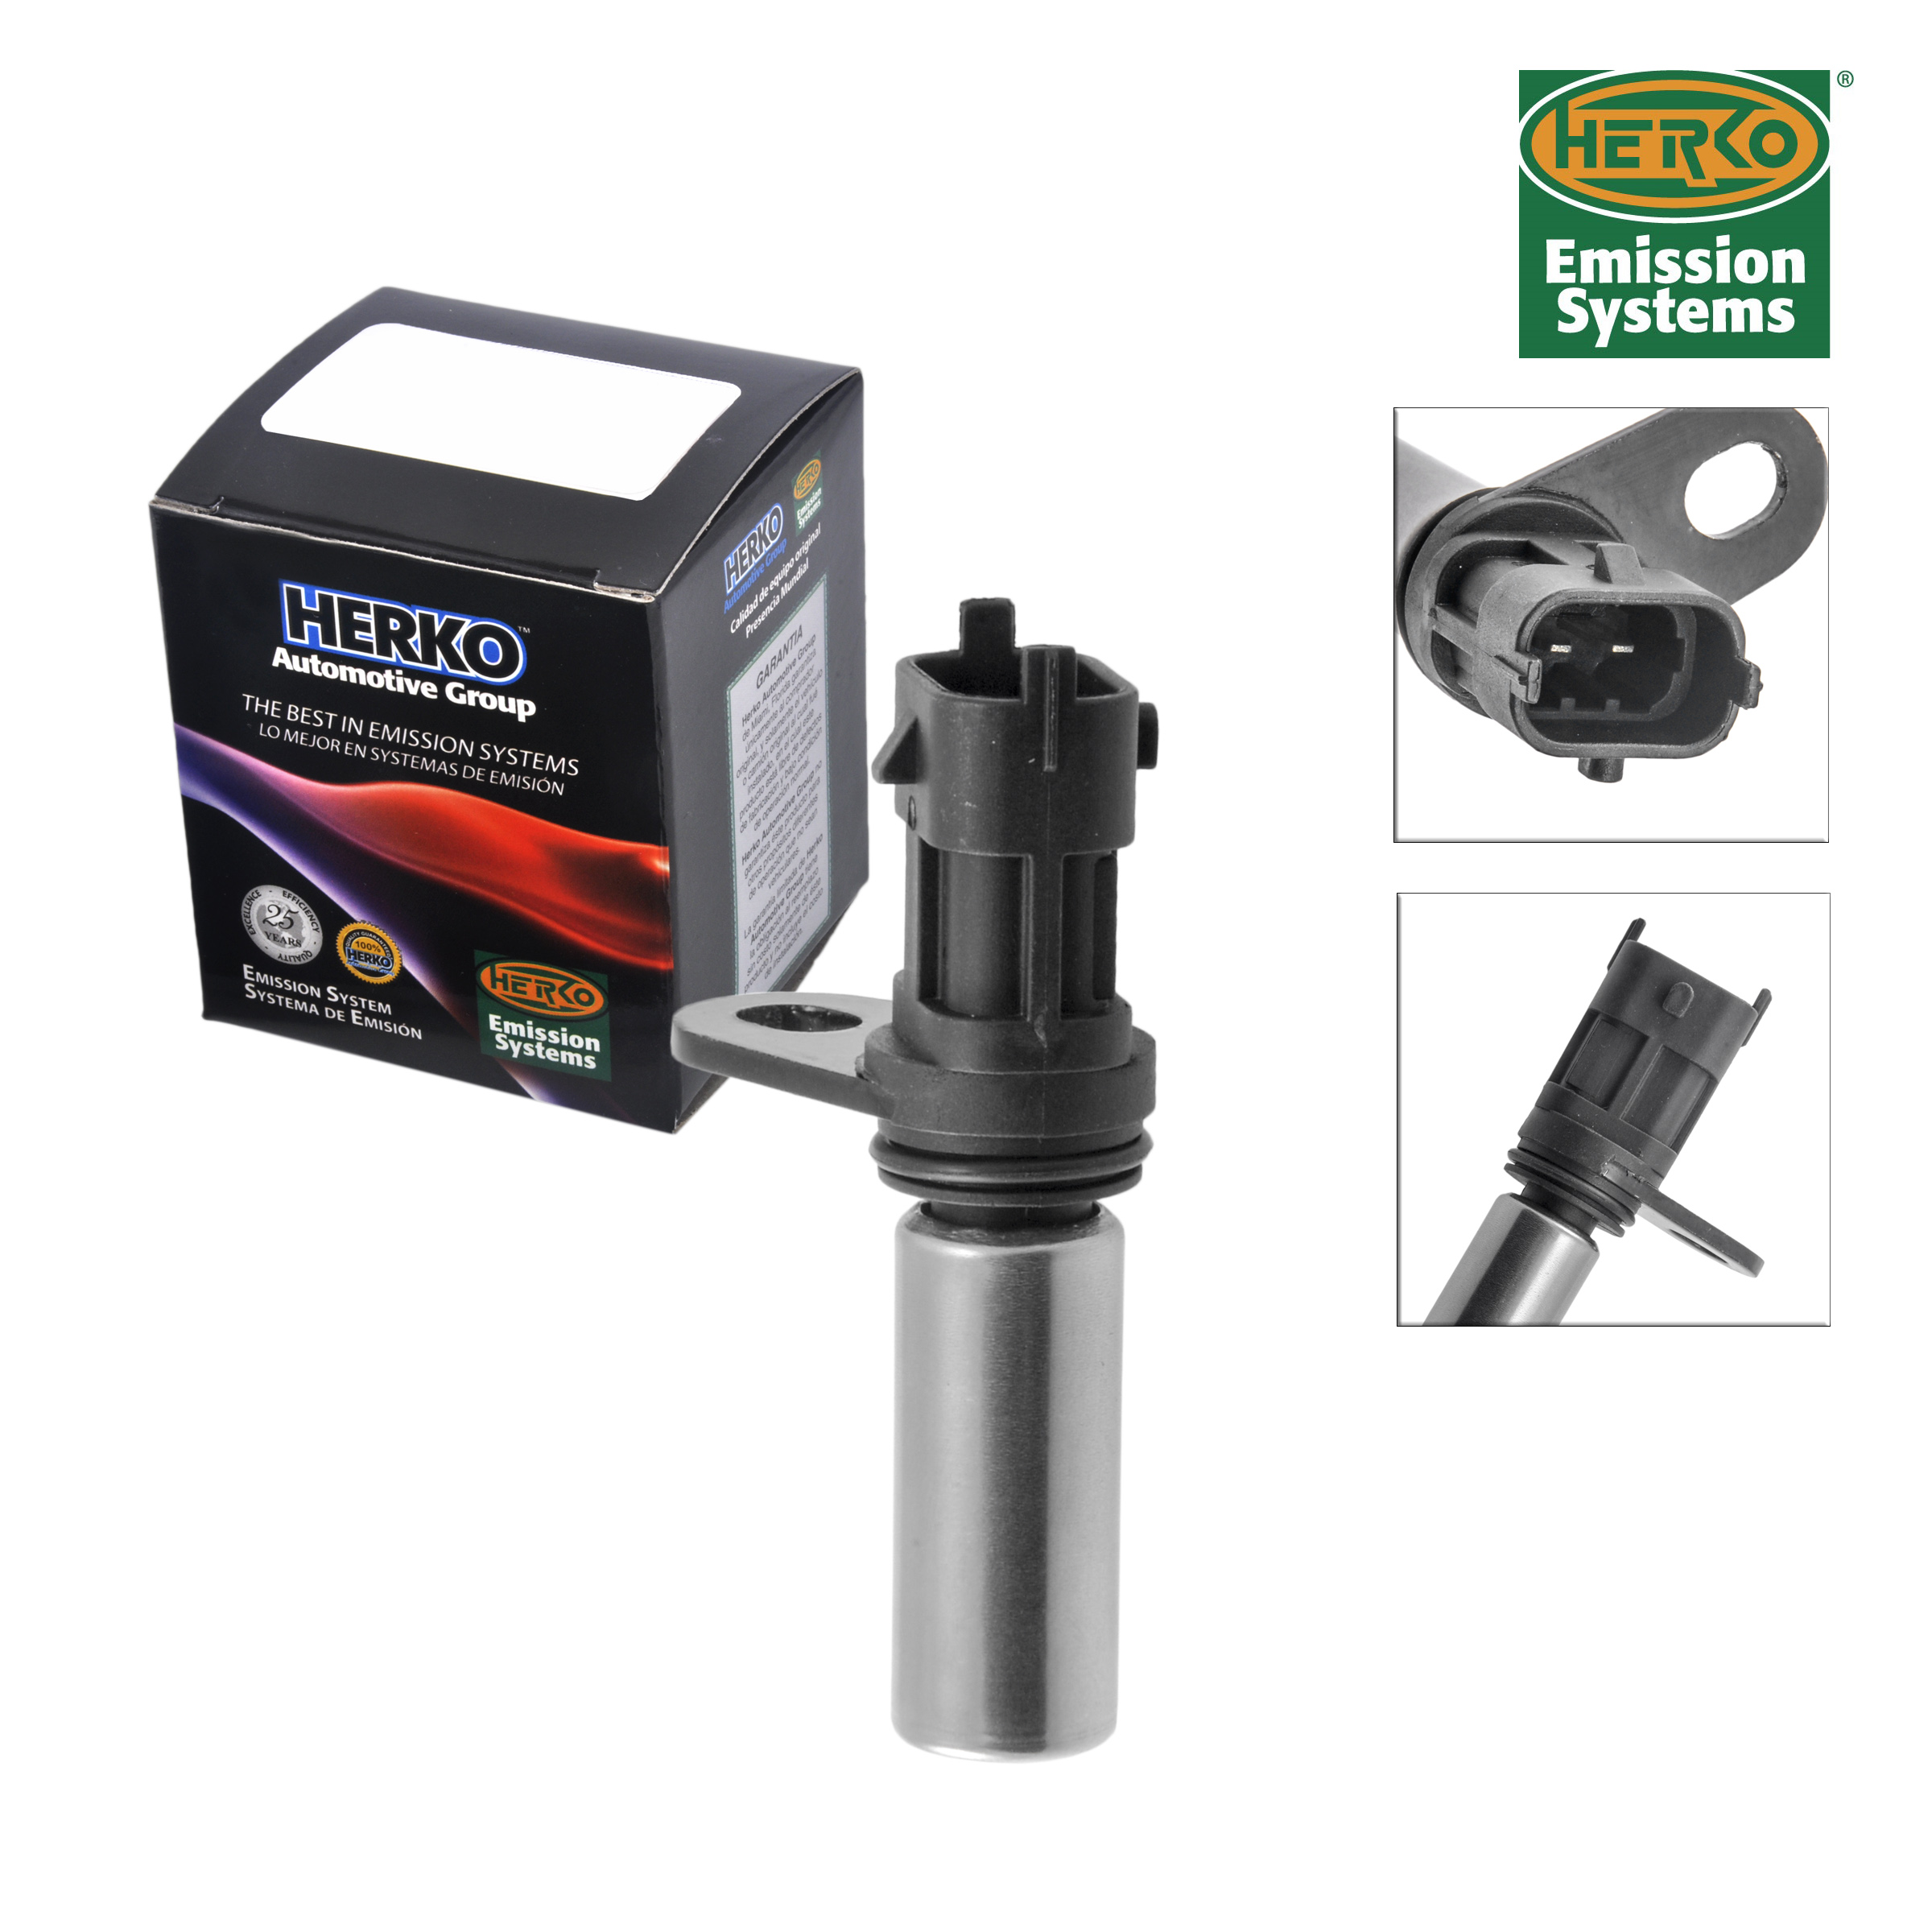 New Herko Crankshaft Position Sensor CKP2065 For Hyundai